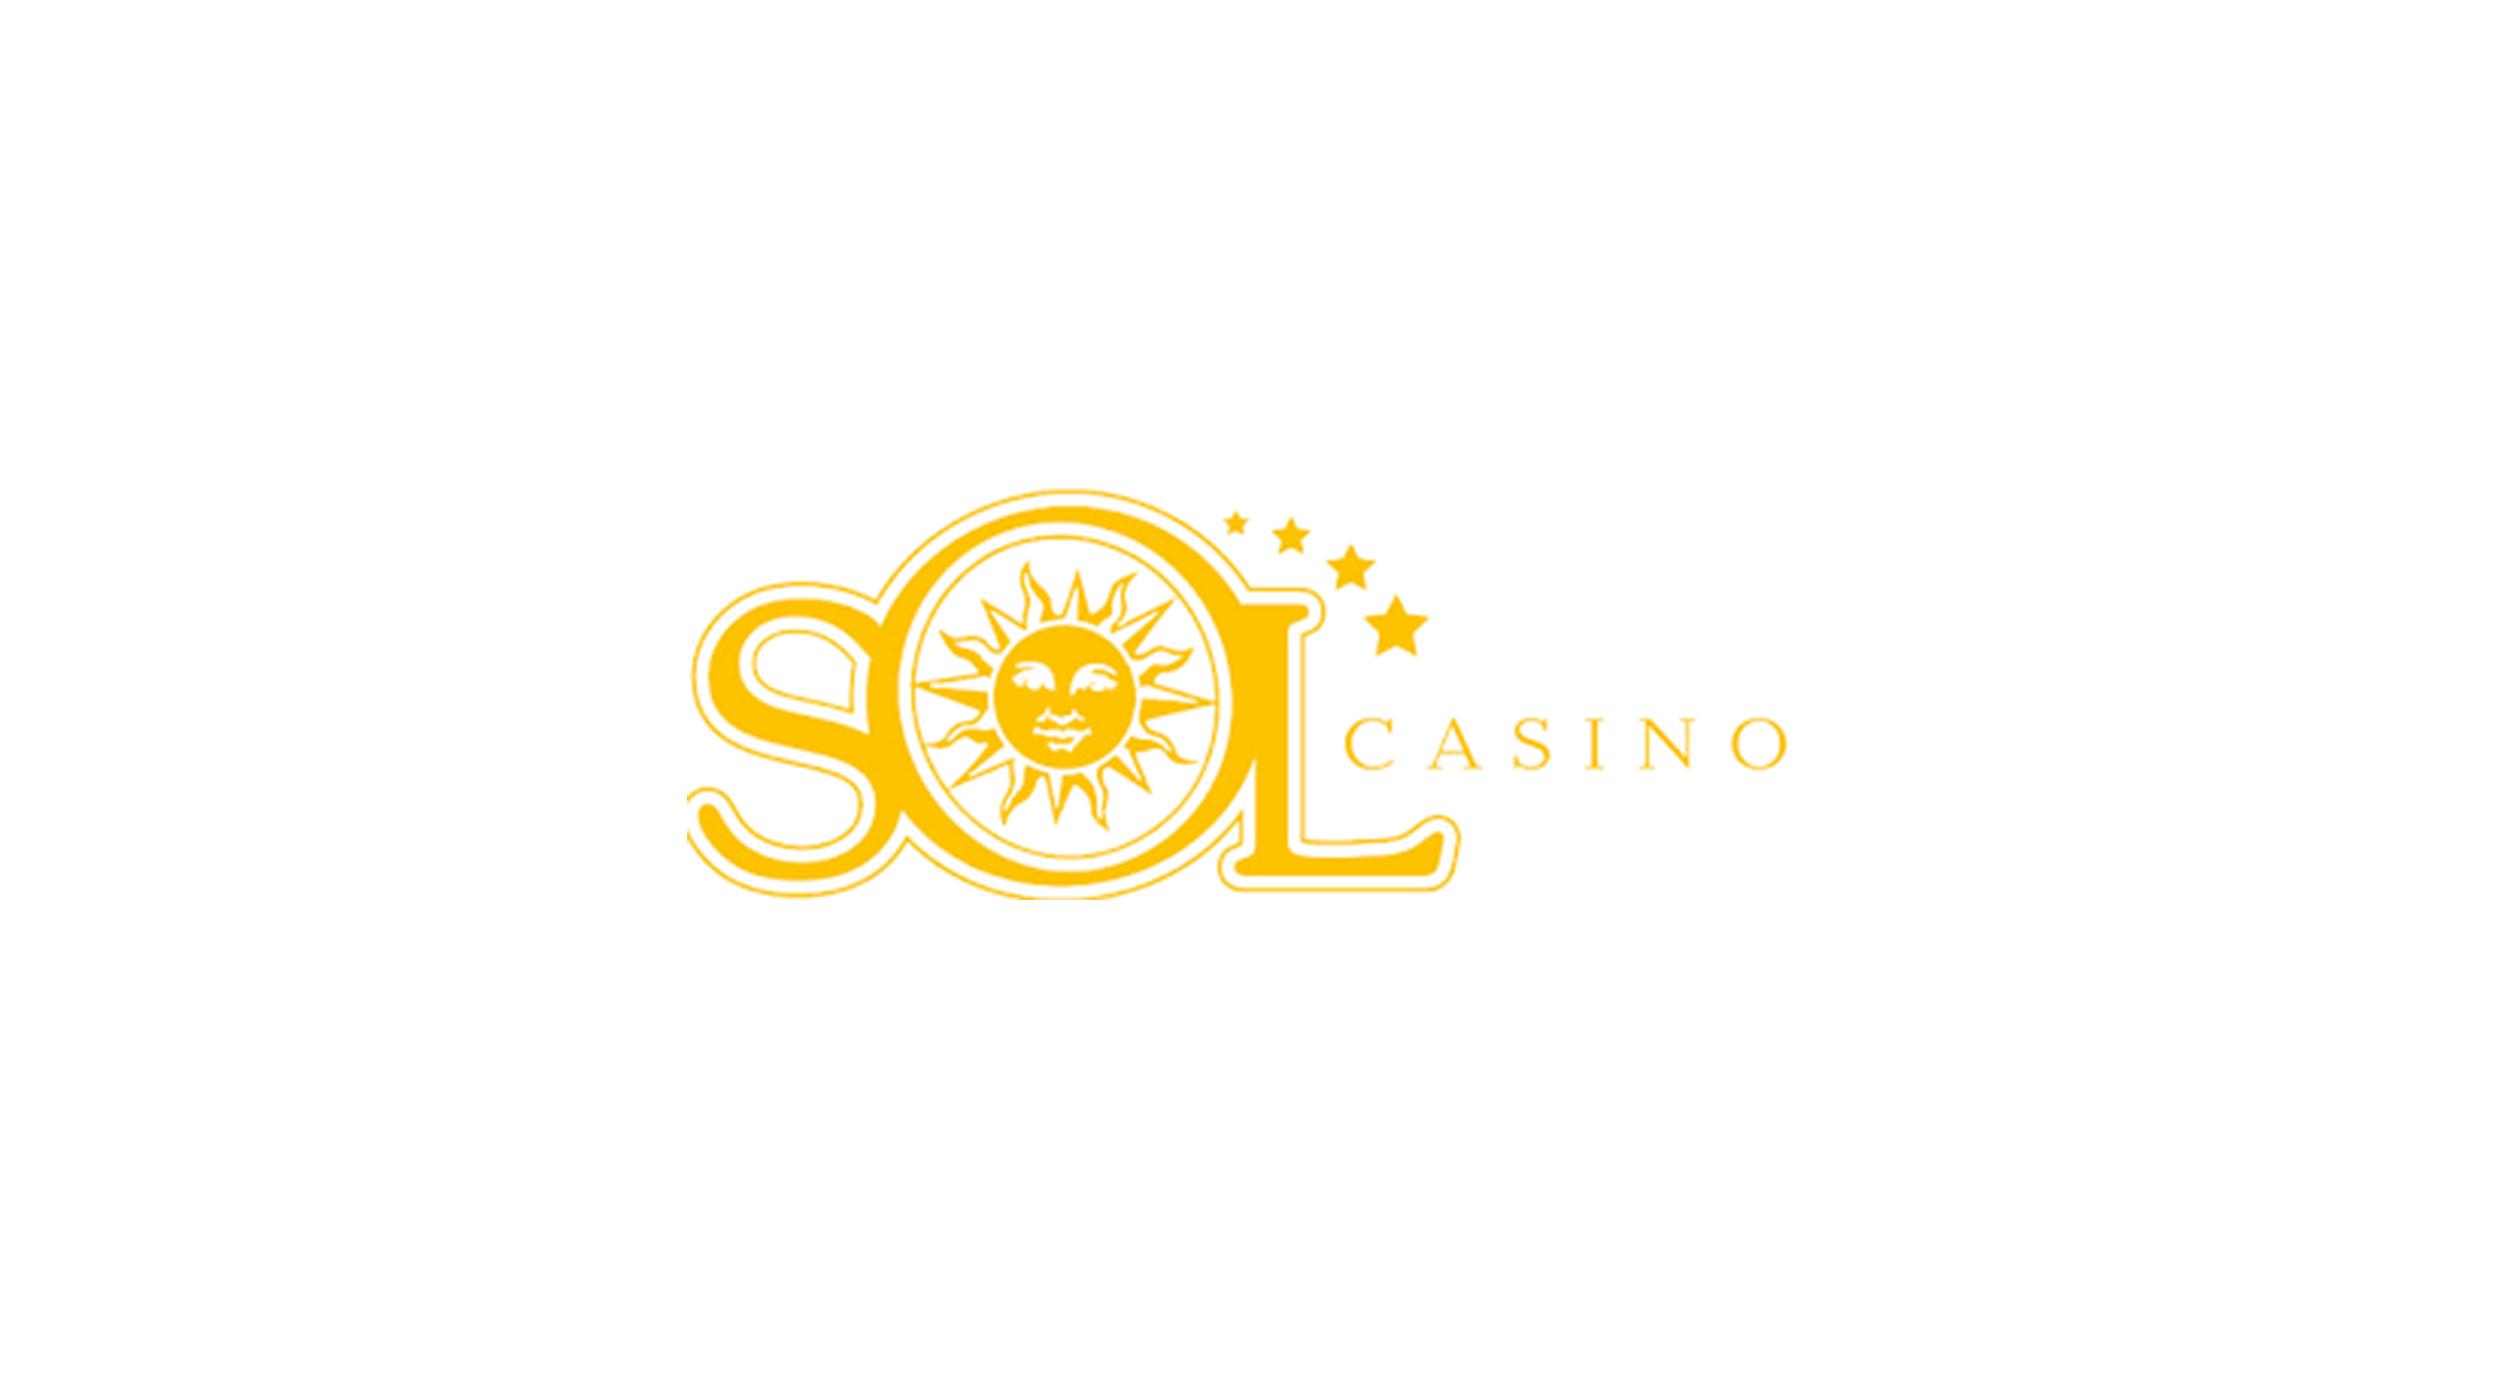 Казино Sol – популярное онлайн-казино